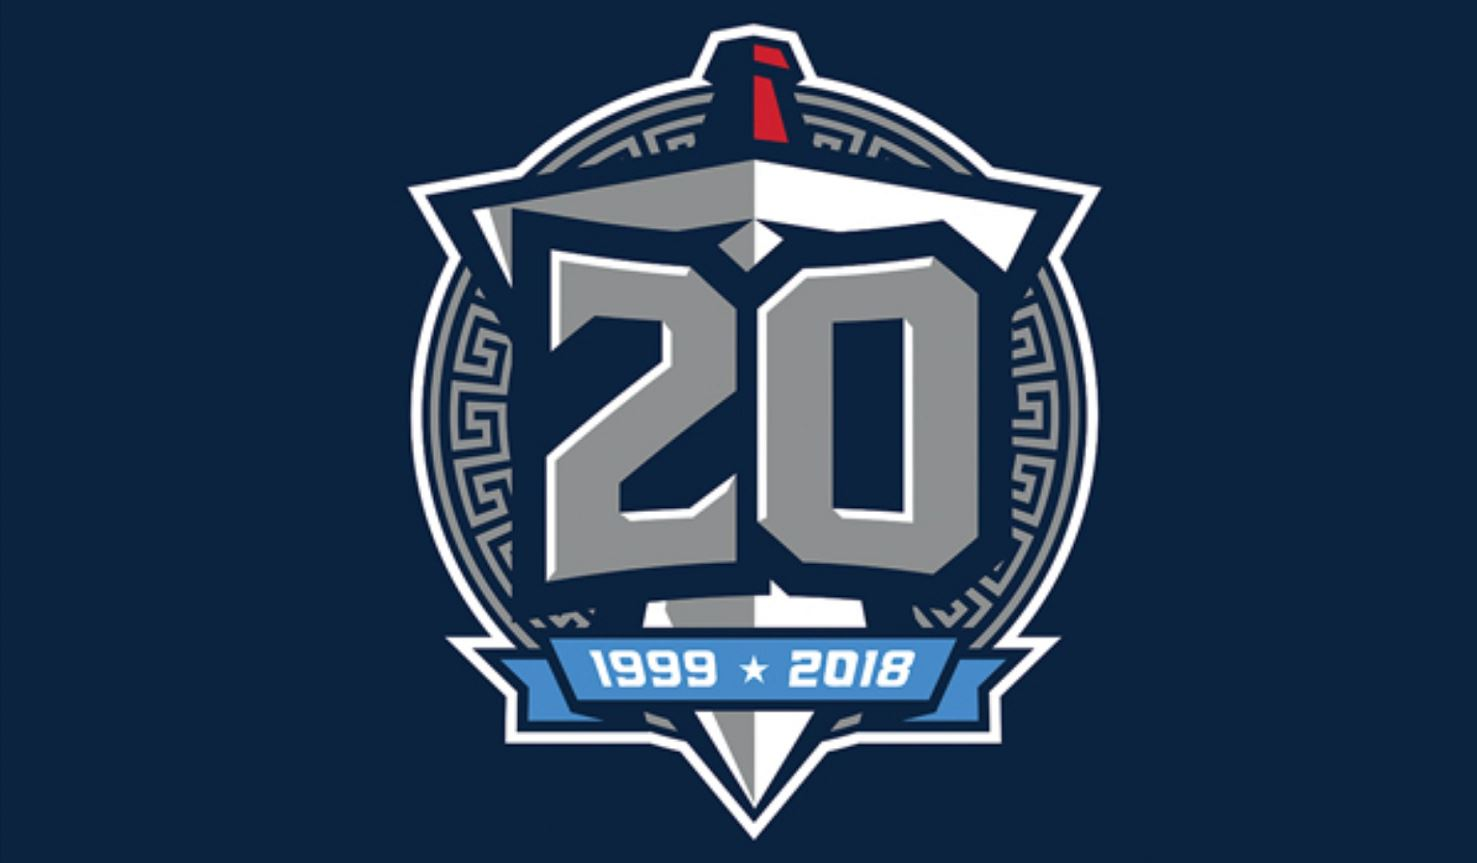 Titans generic new logo 2018_1533399234875.JPG.jpg